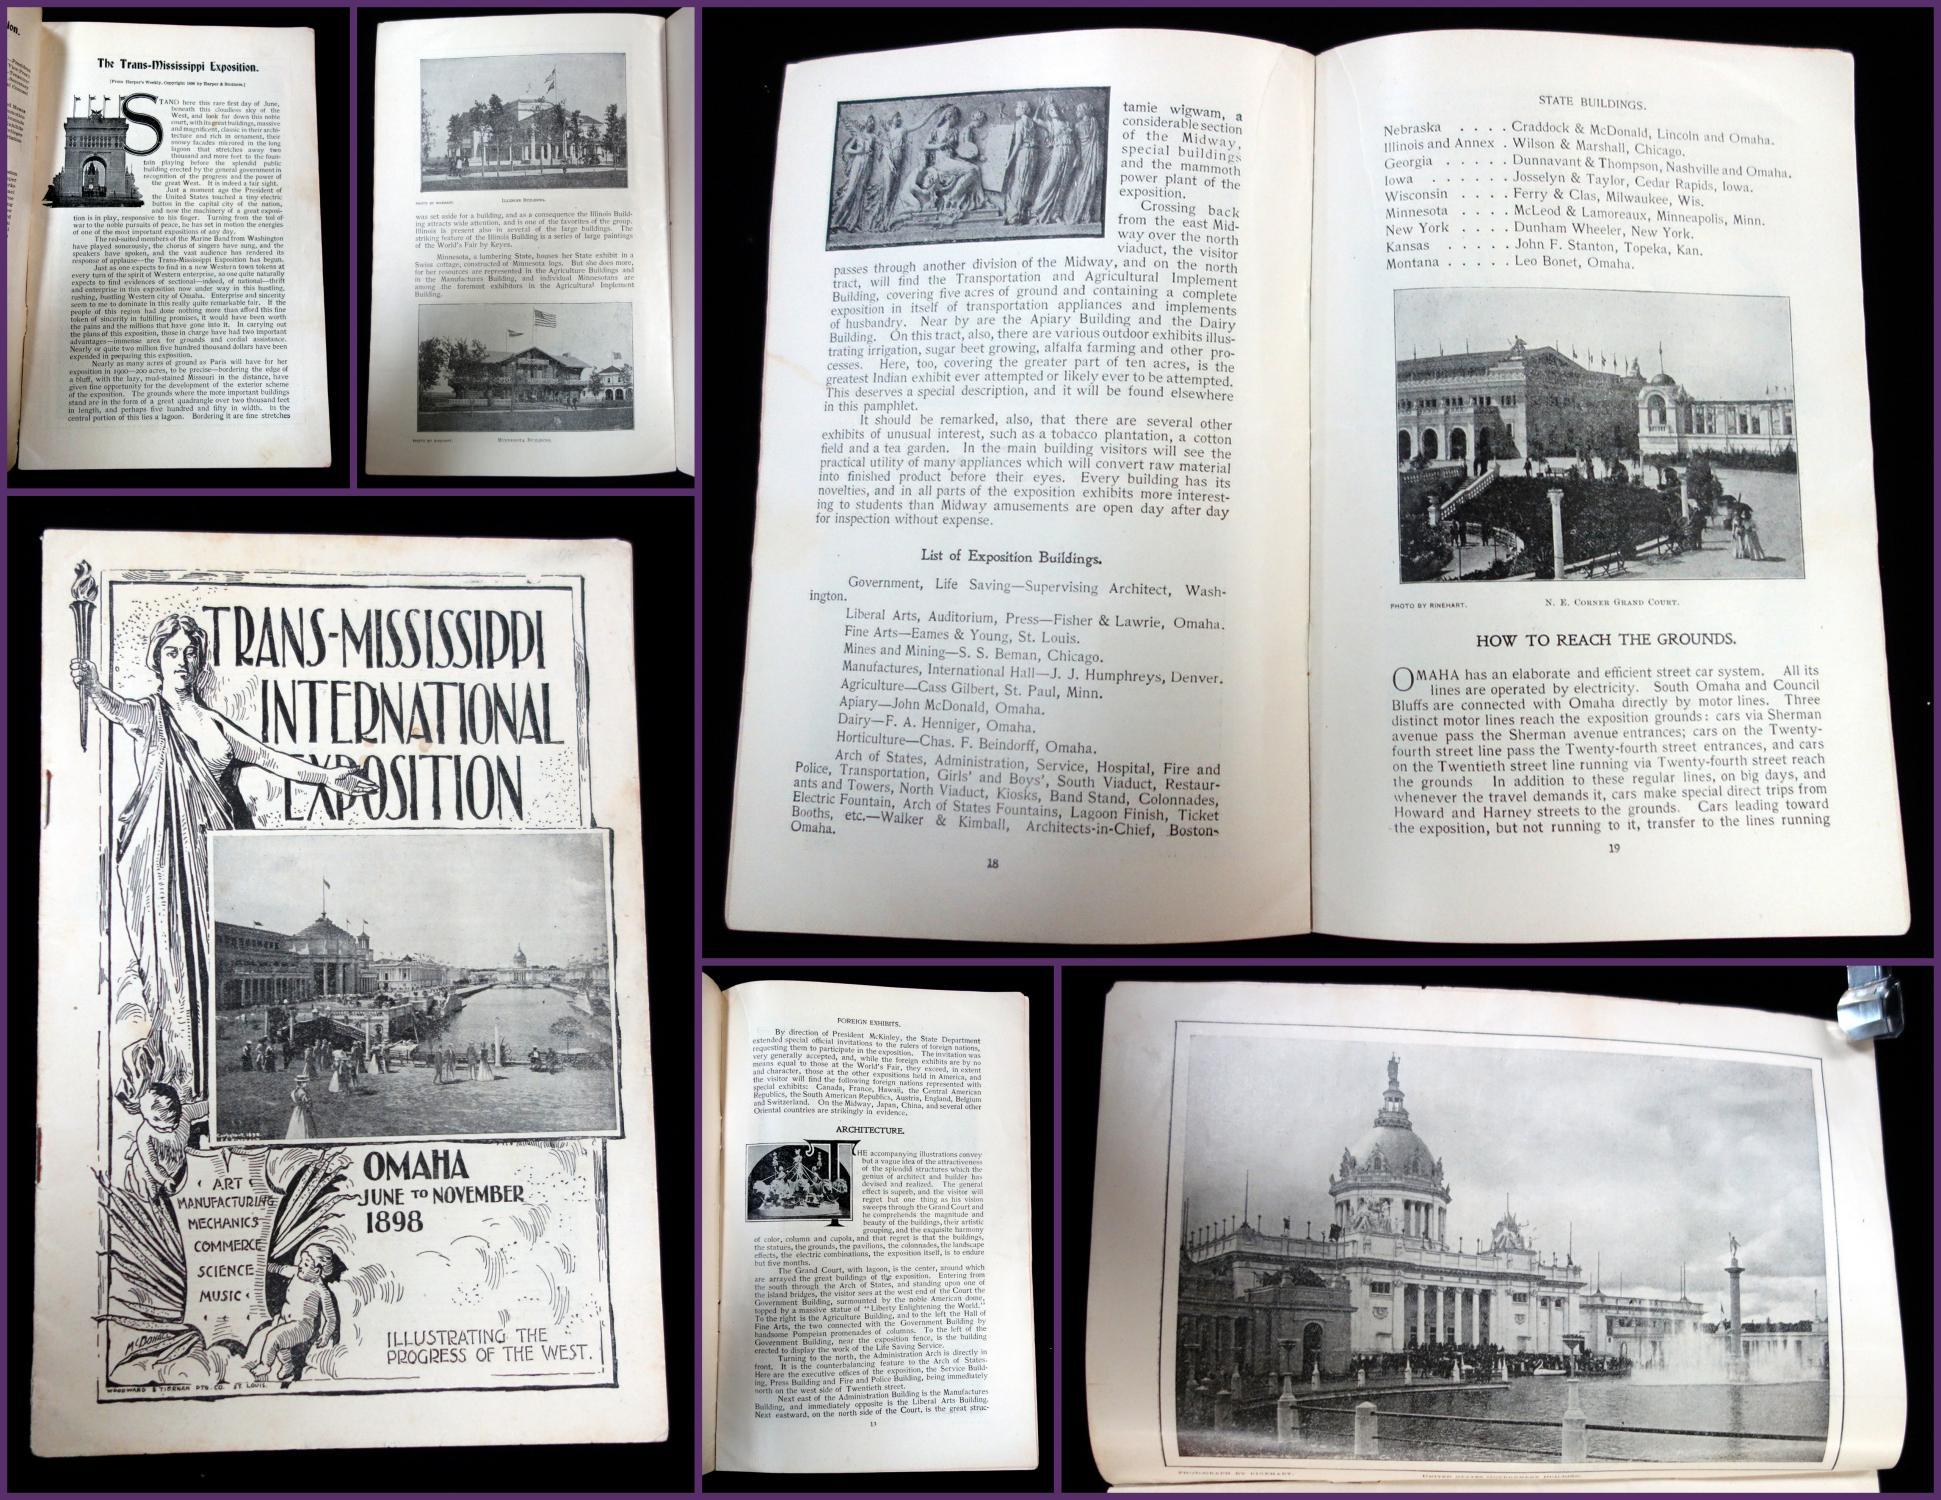 Trans-Mississippi International Exposition Program, June to November: Harper's Weekly